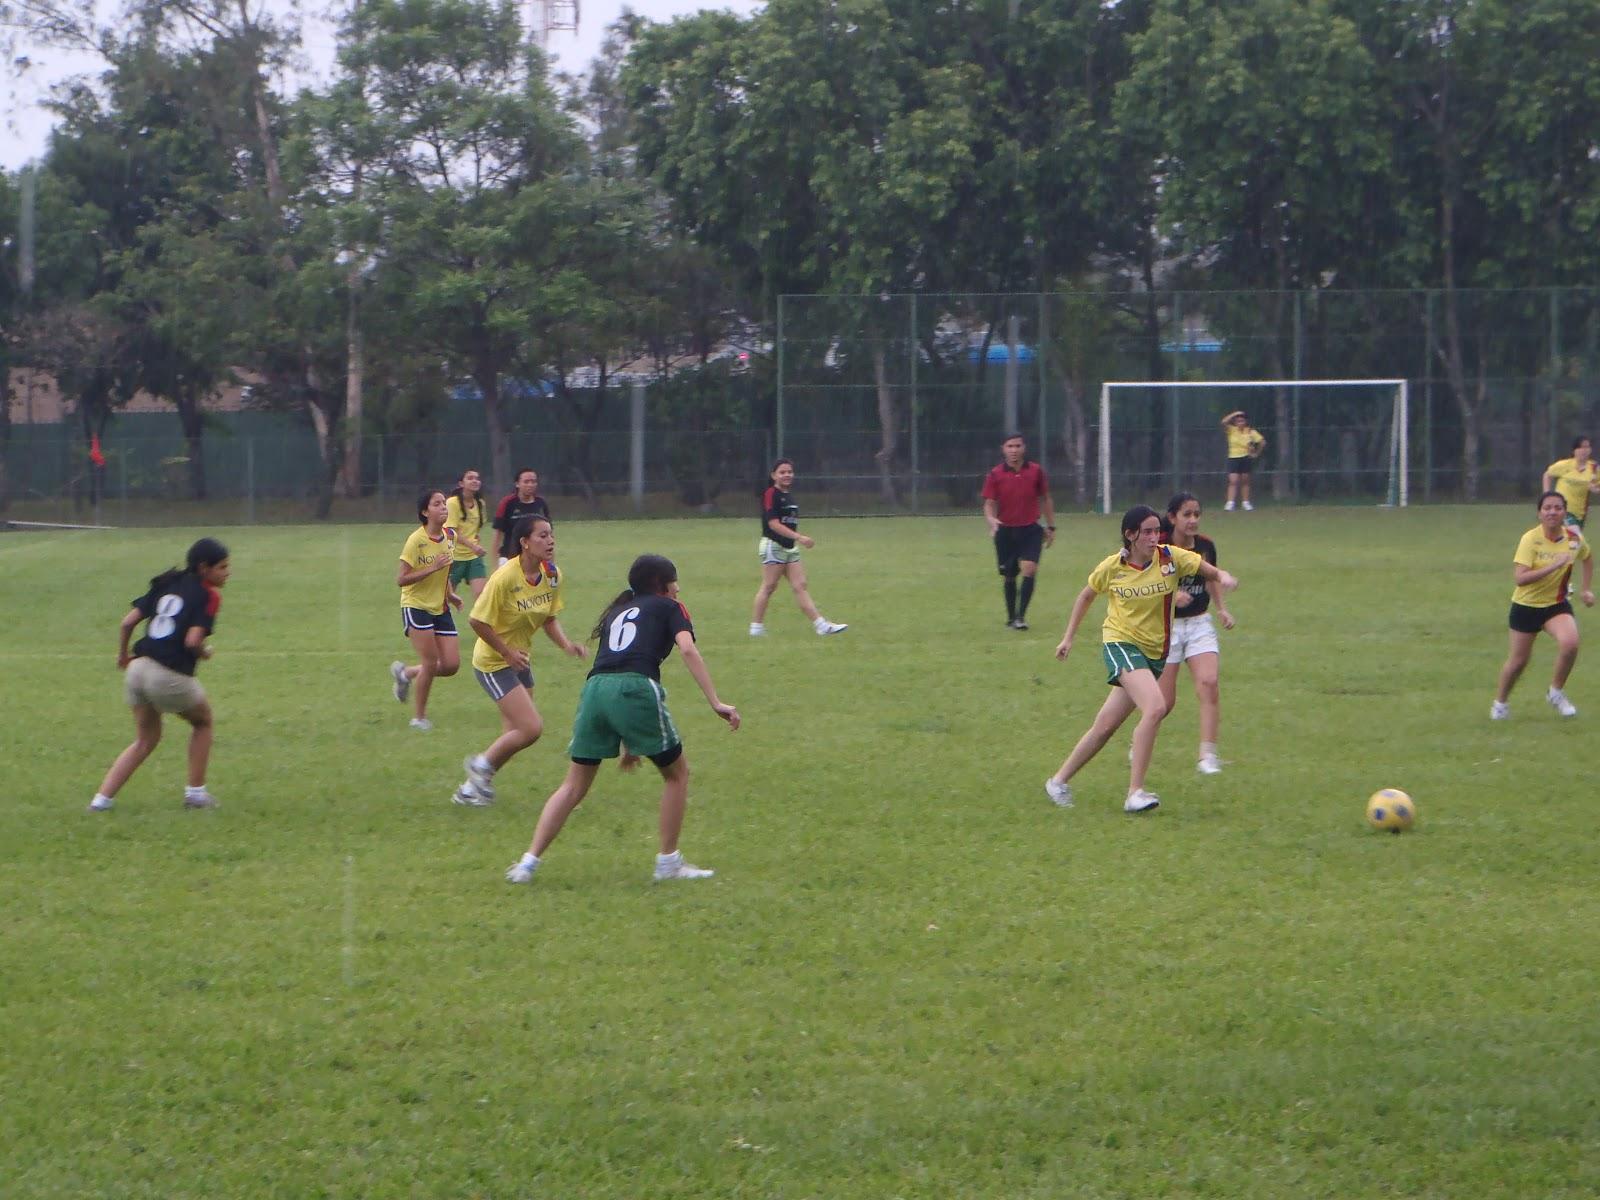 Intramuros De Futbol Femenino Ex Teen Zone